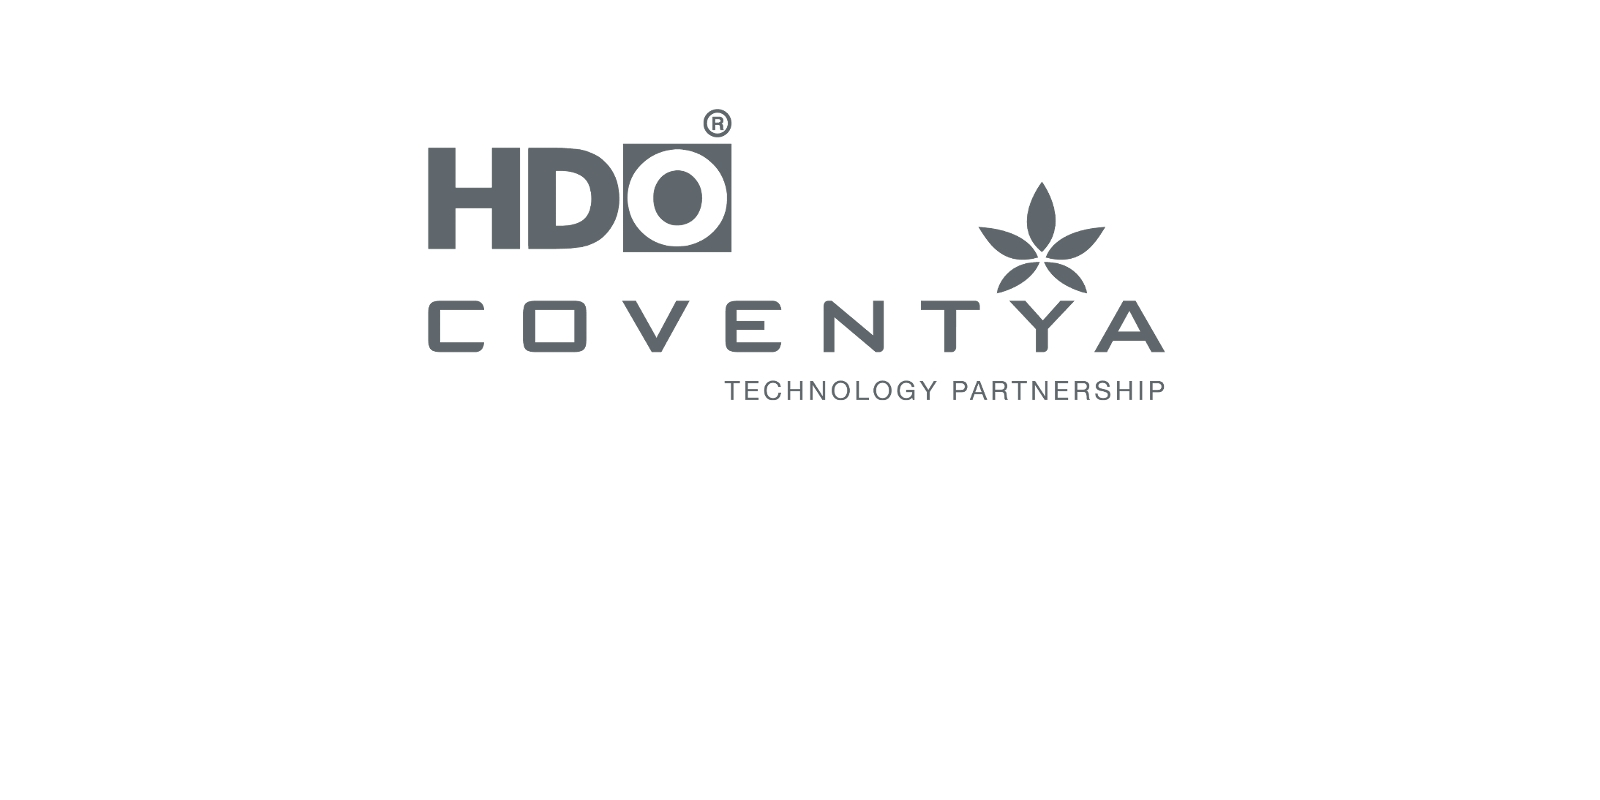 https://hdo-gmbh.com/wp-content/uploads/HDO_Coventya_partnerschip_grey_white_1600x800-2.jpg